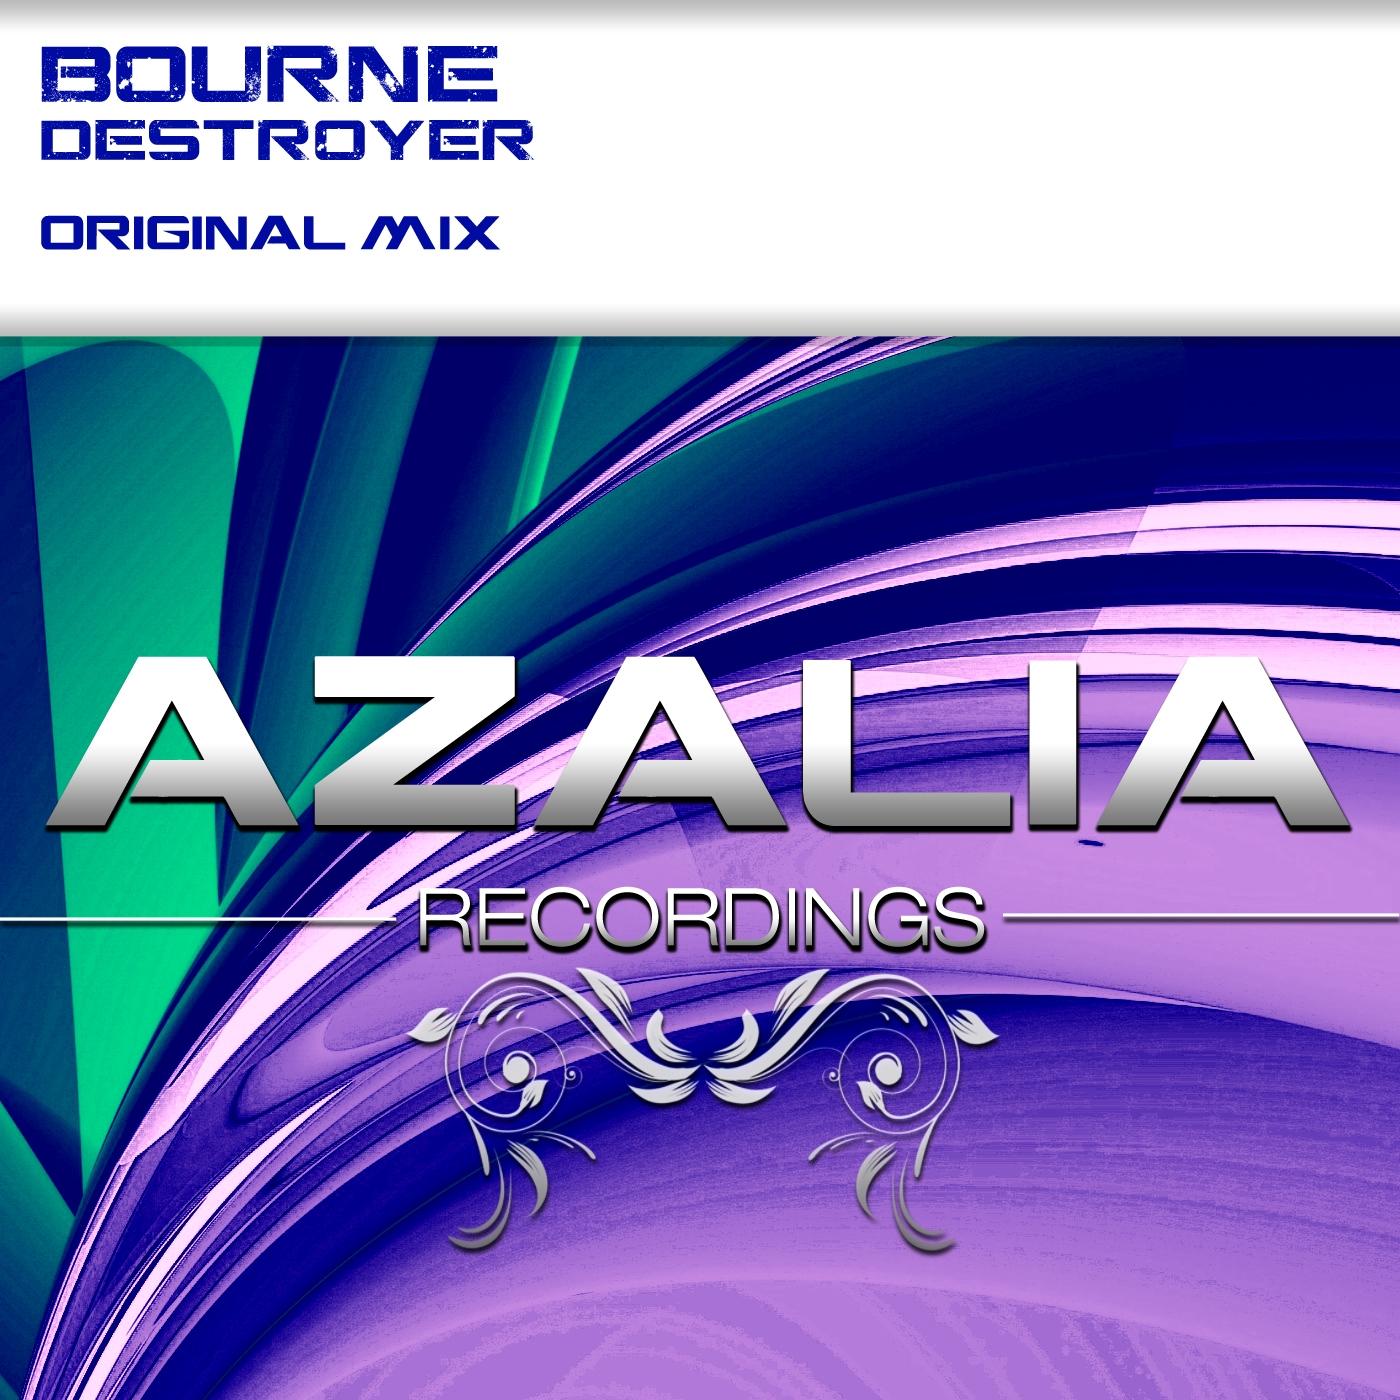 Bourne - Destroyer (Original Mix)